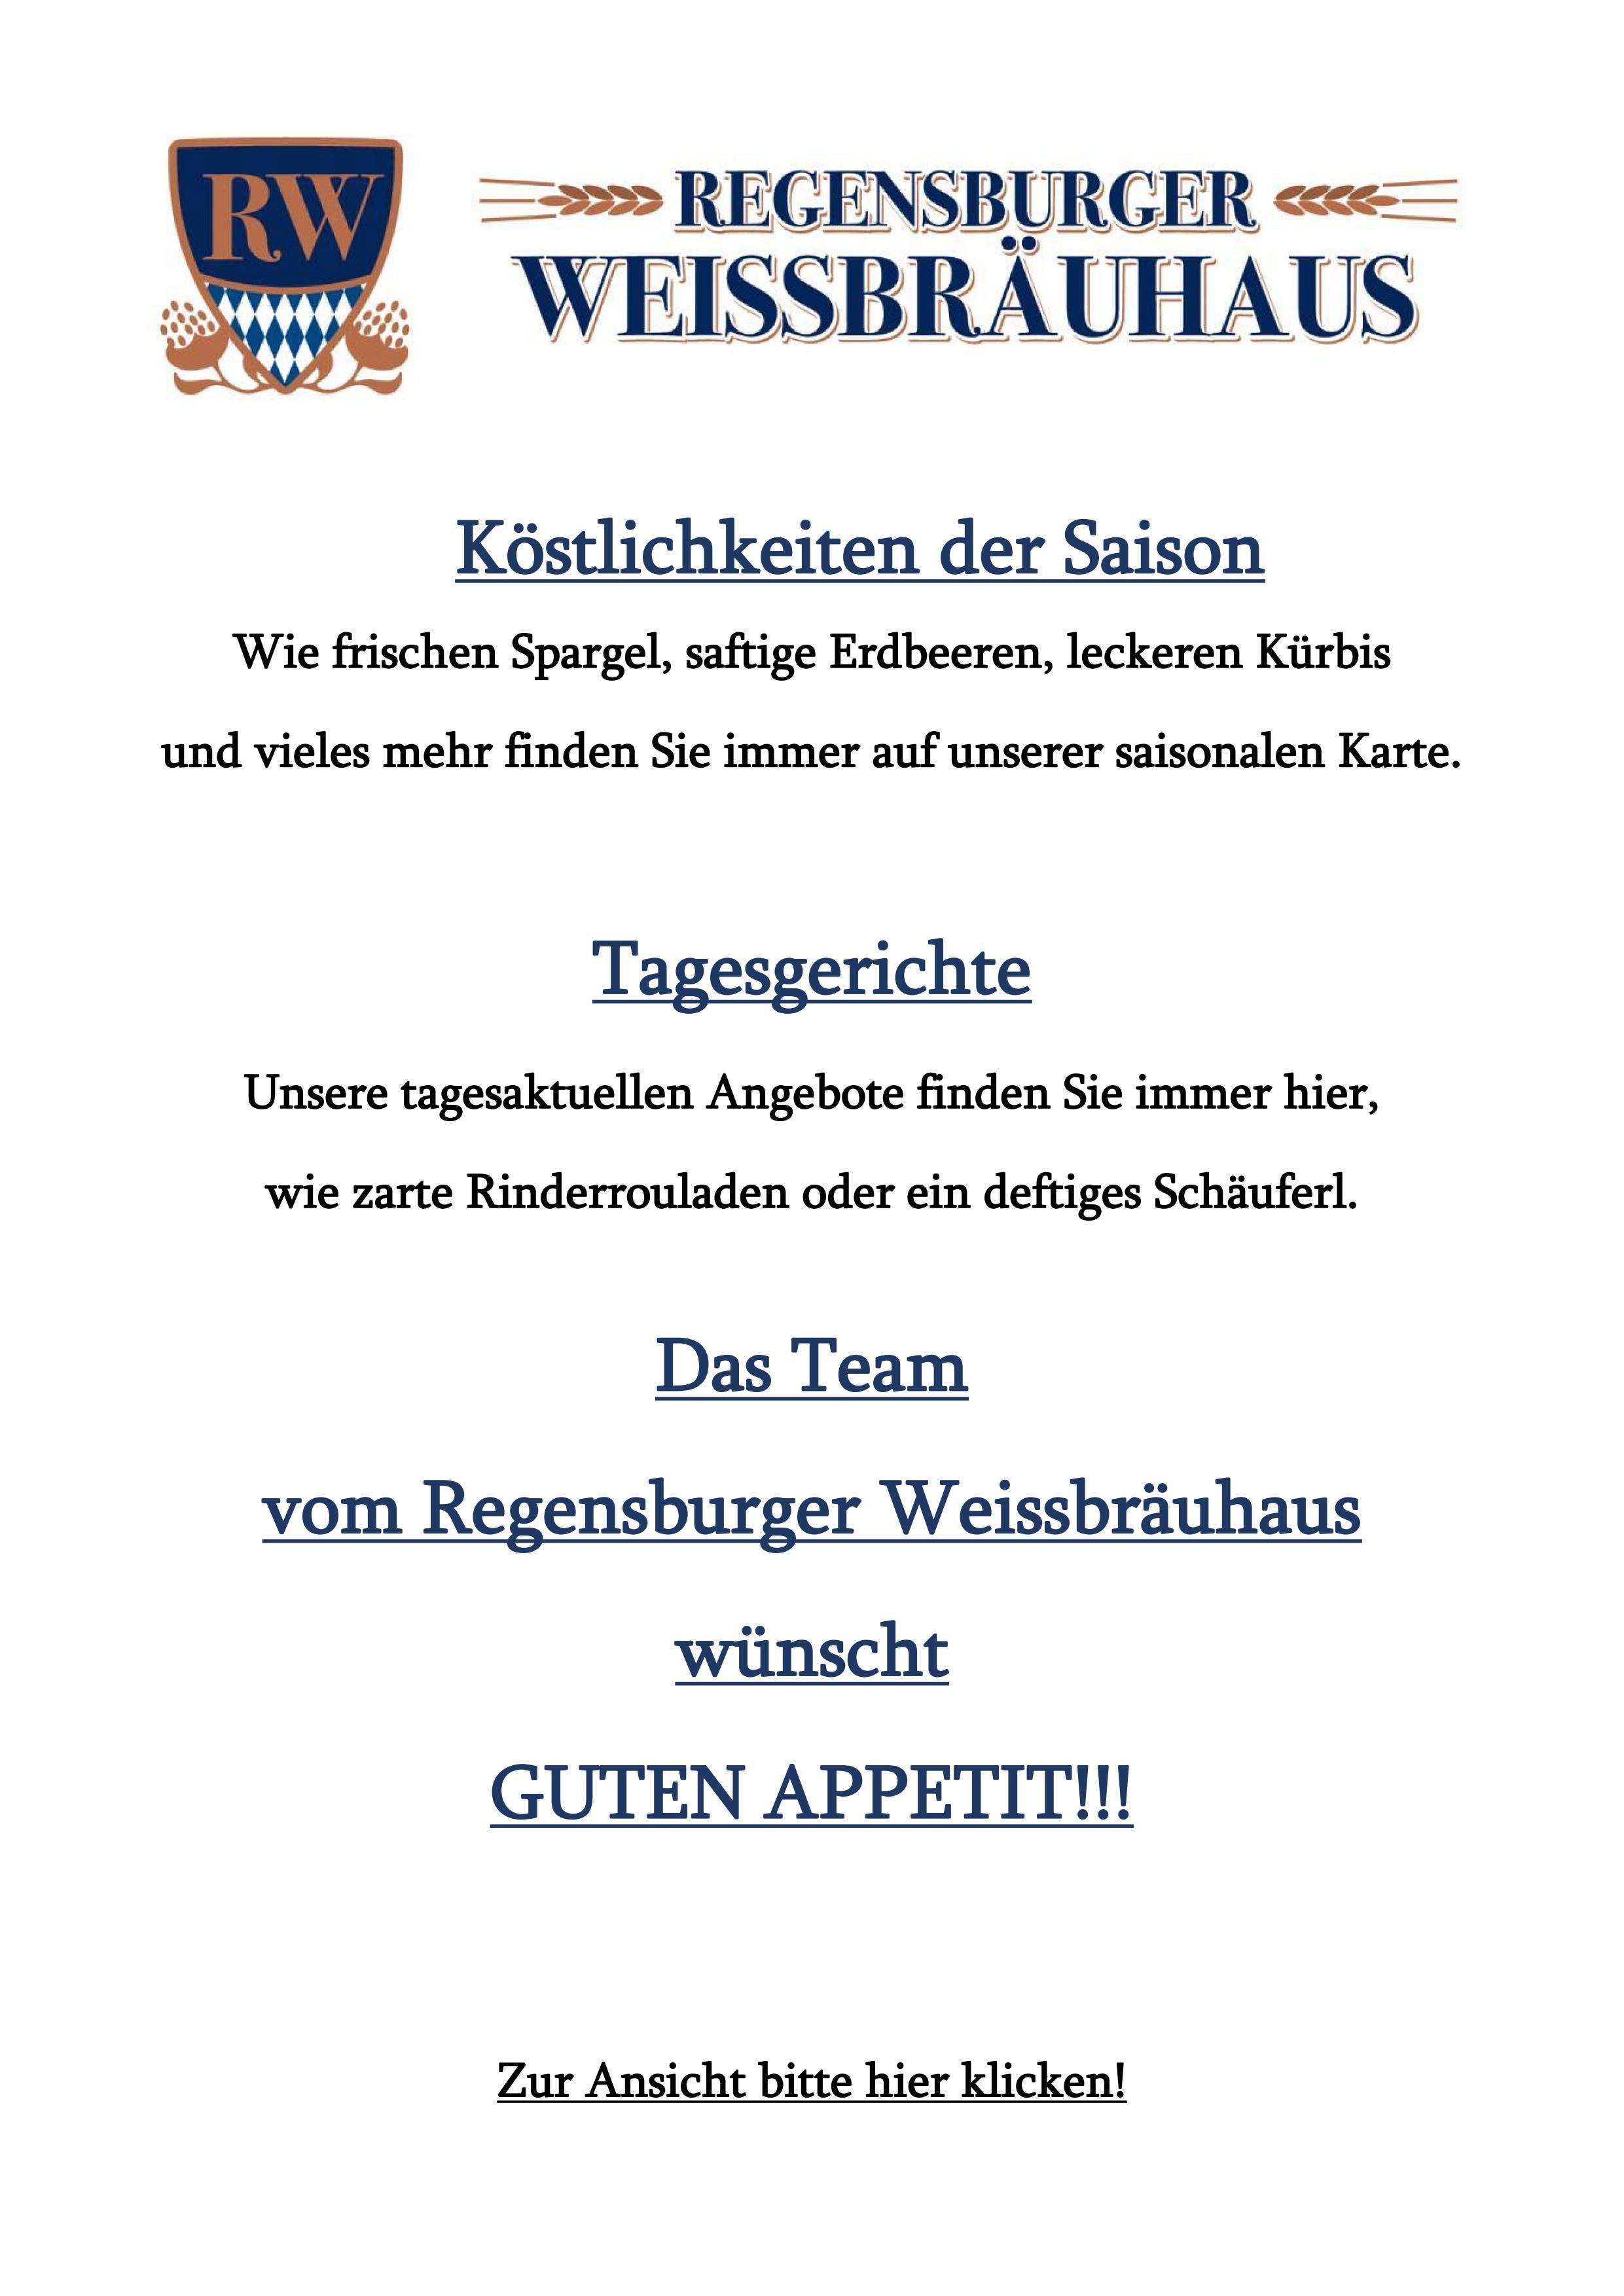 Kuche regensburg for Kuchenstudio ingolstadt